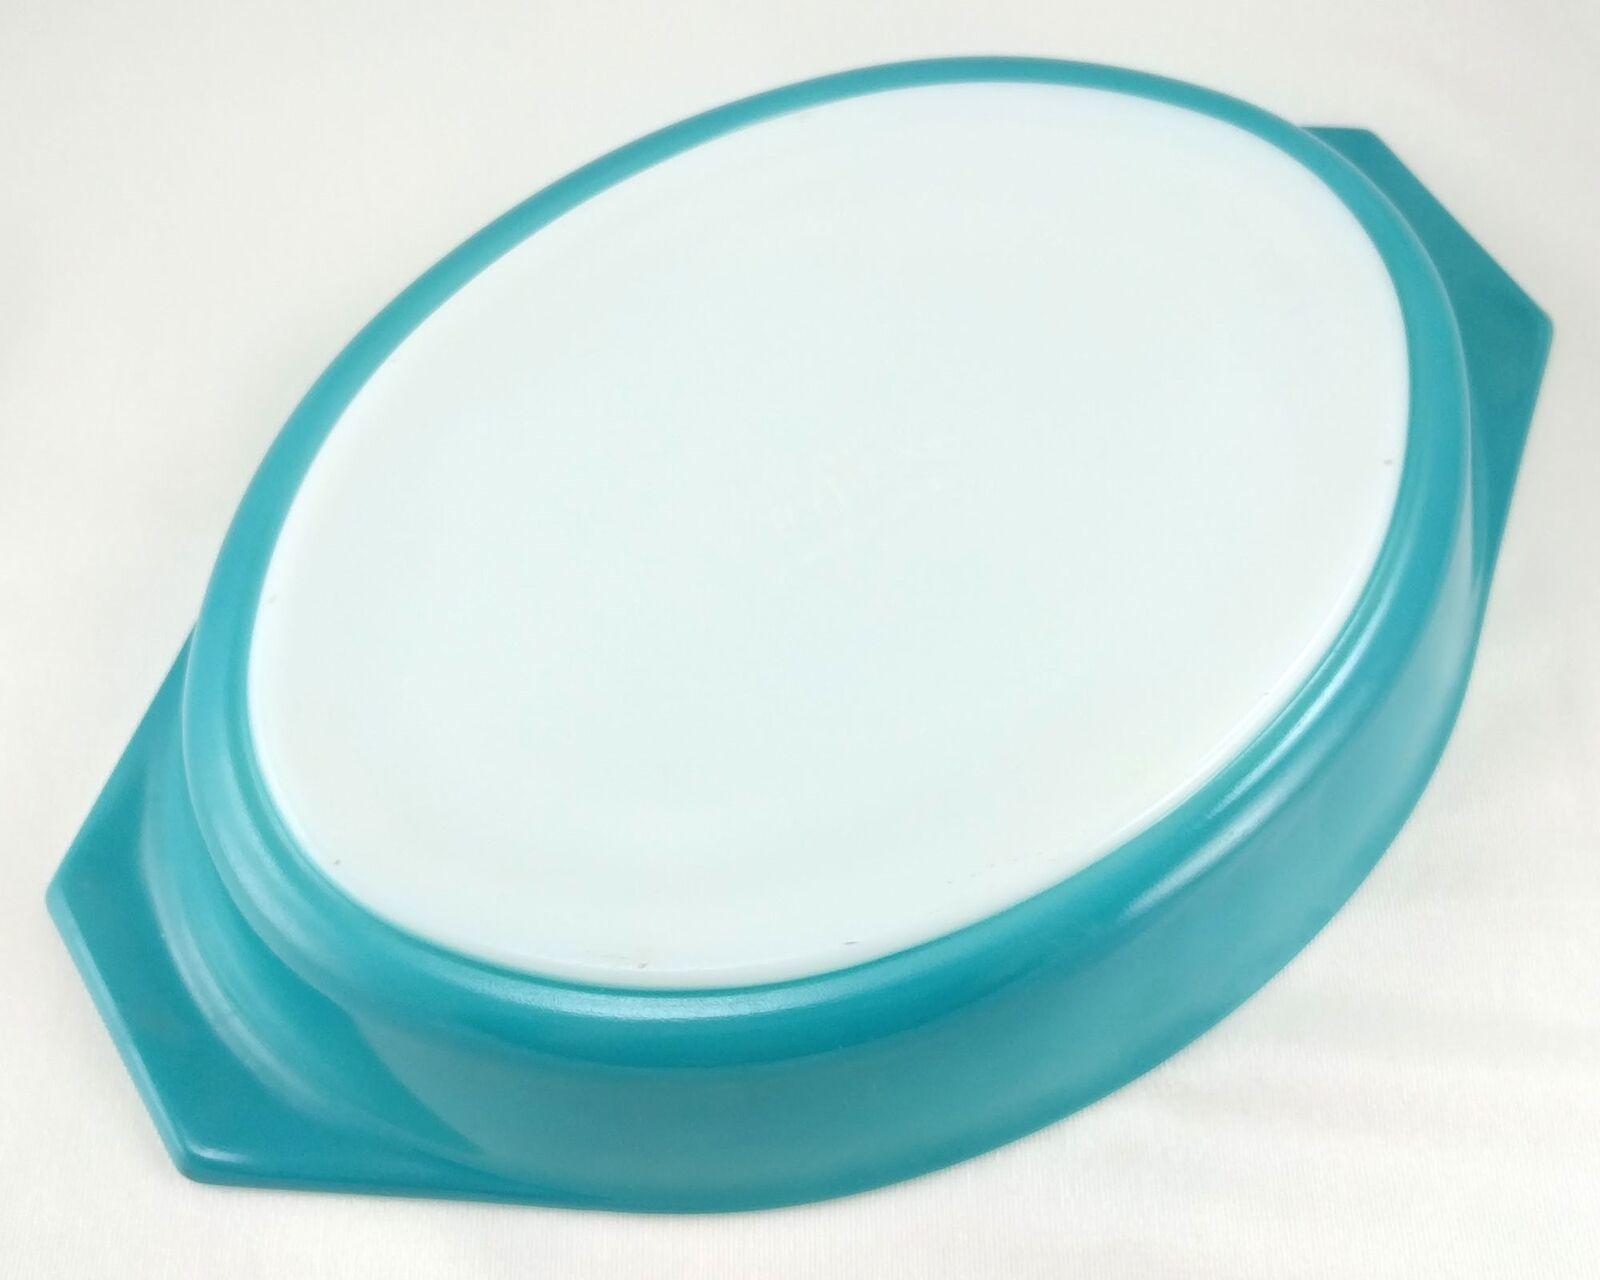 Pyrex Turquoise Oval Princess 1½ qt Casserole Dish Gold Color Scroll 945C Lid image 7